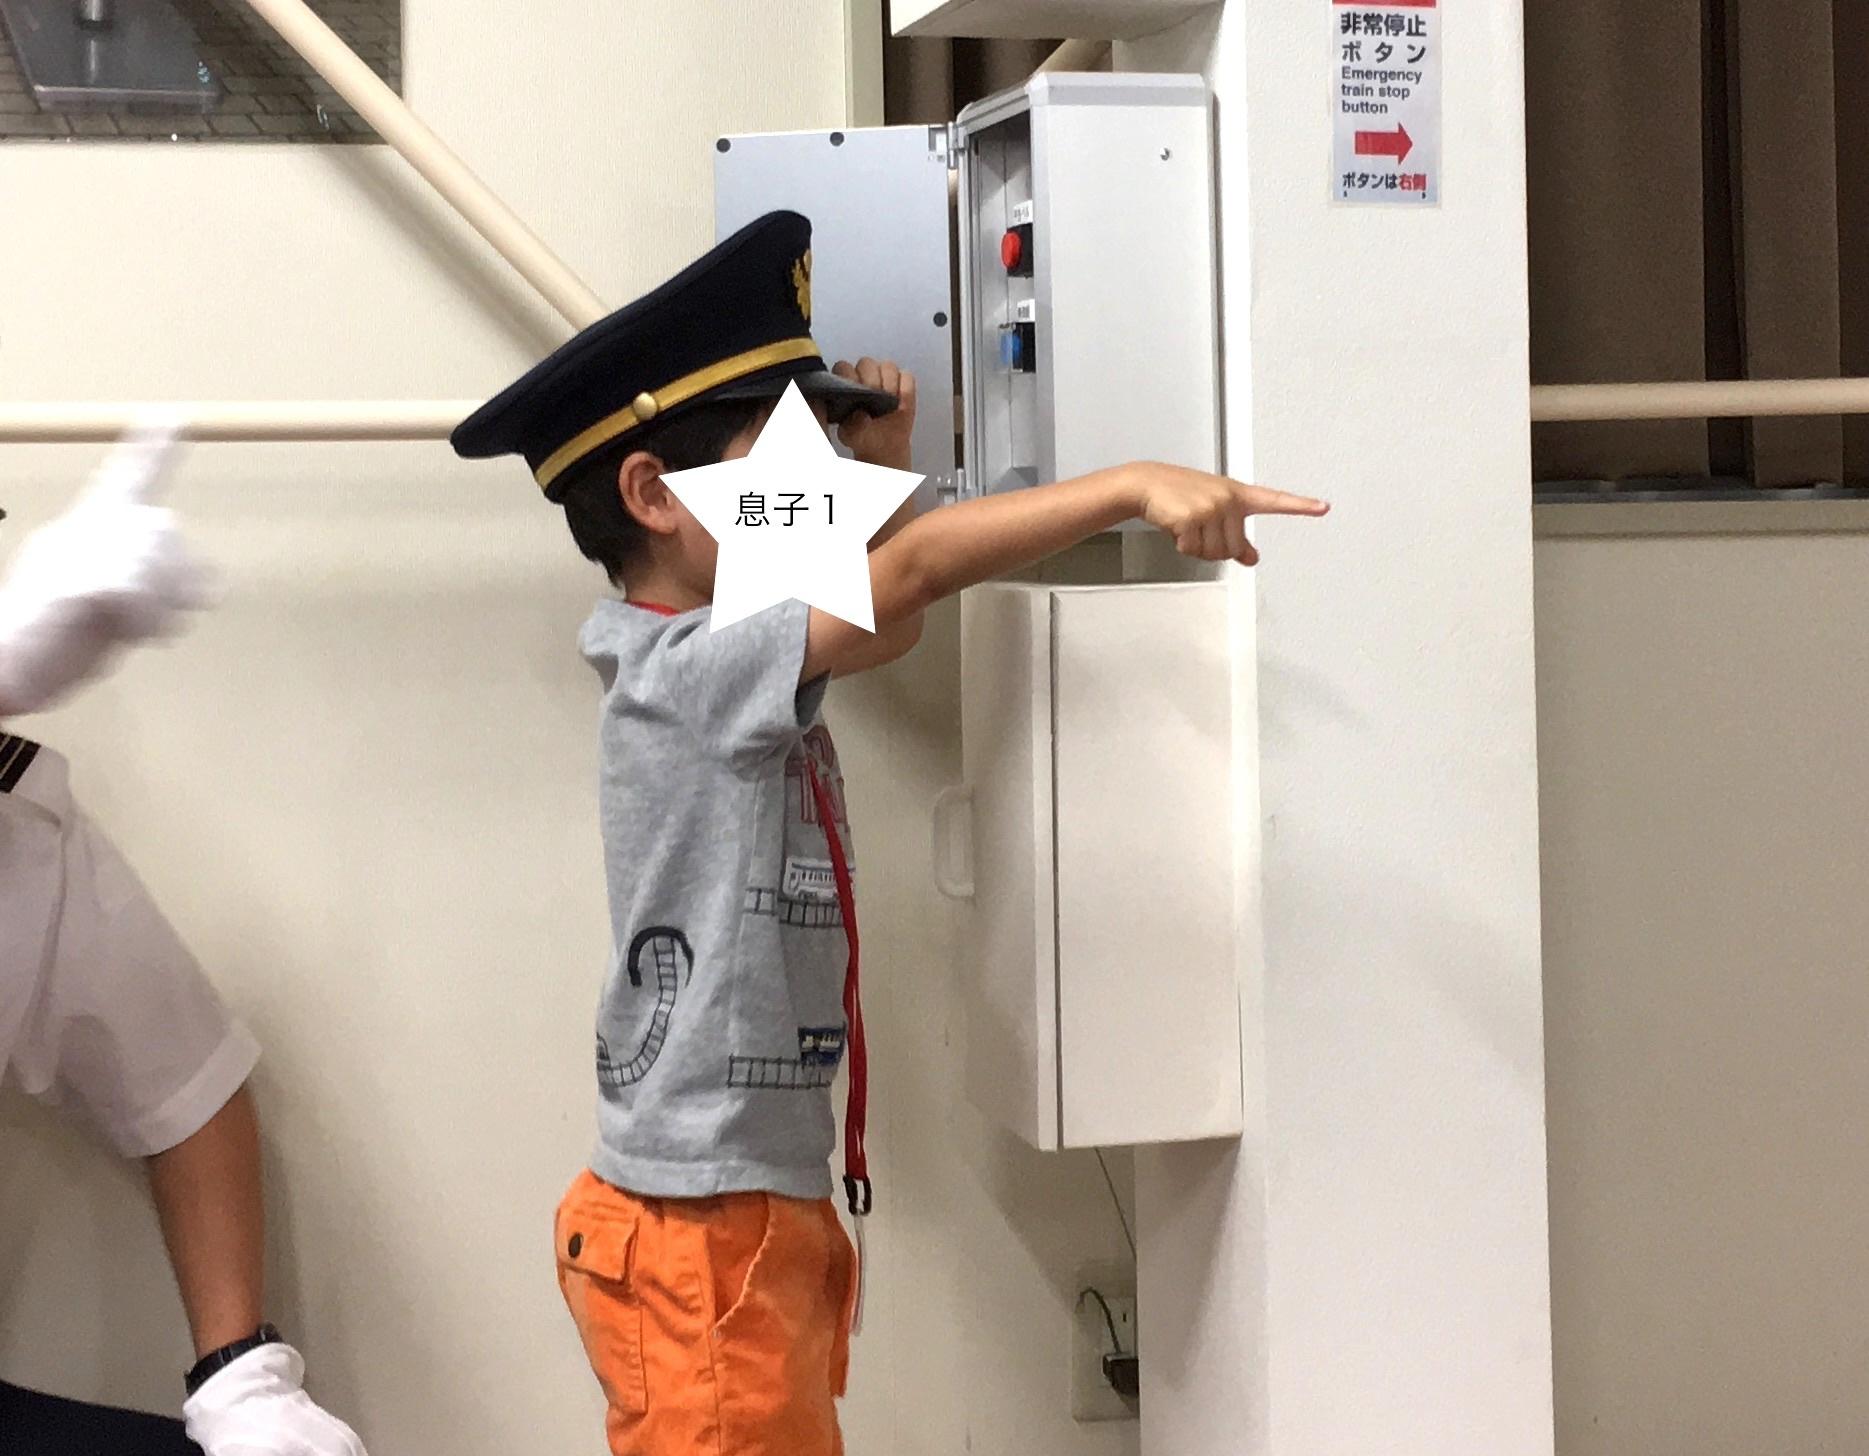 JR東海30周年記念!静岡駅のお仕事体験イベント!(後編)_d0367998_00253445.jpg